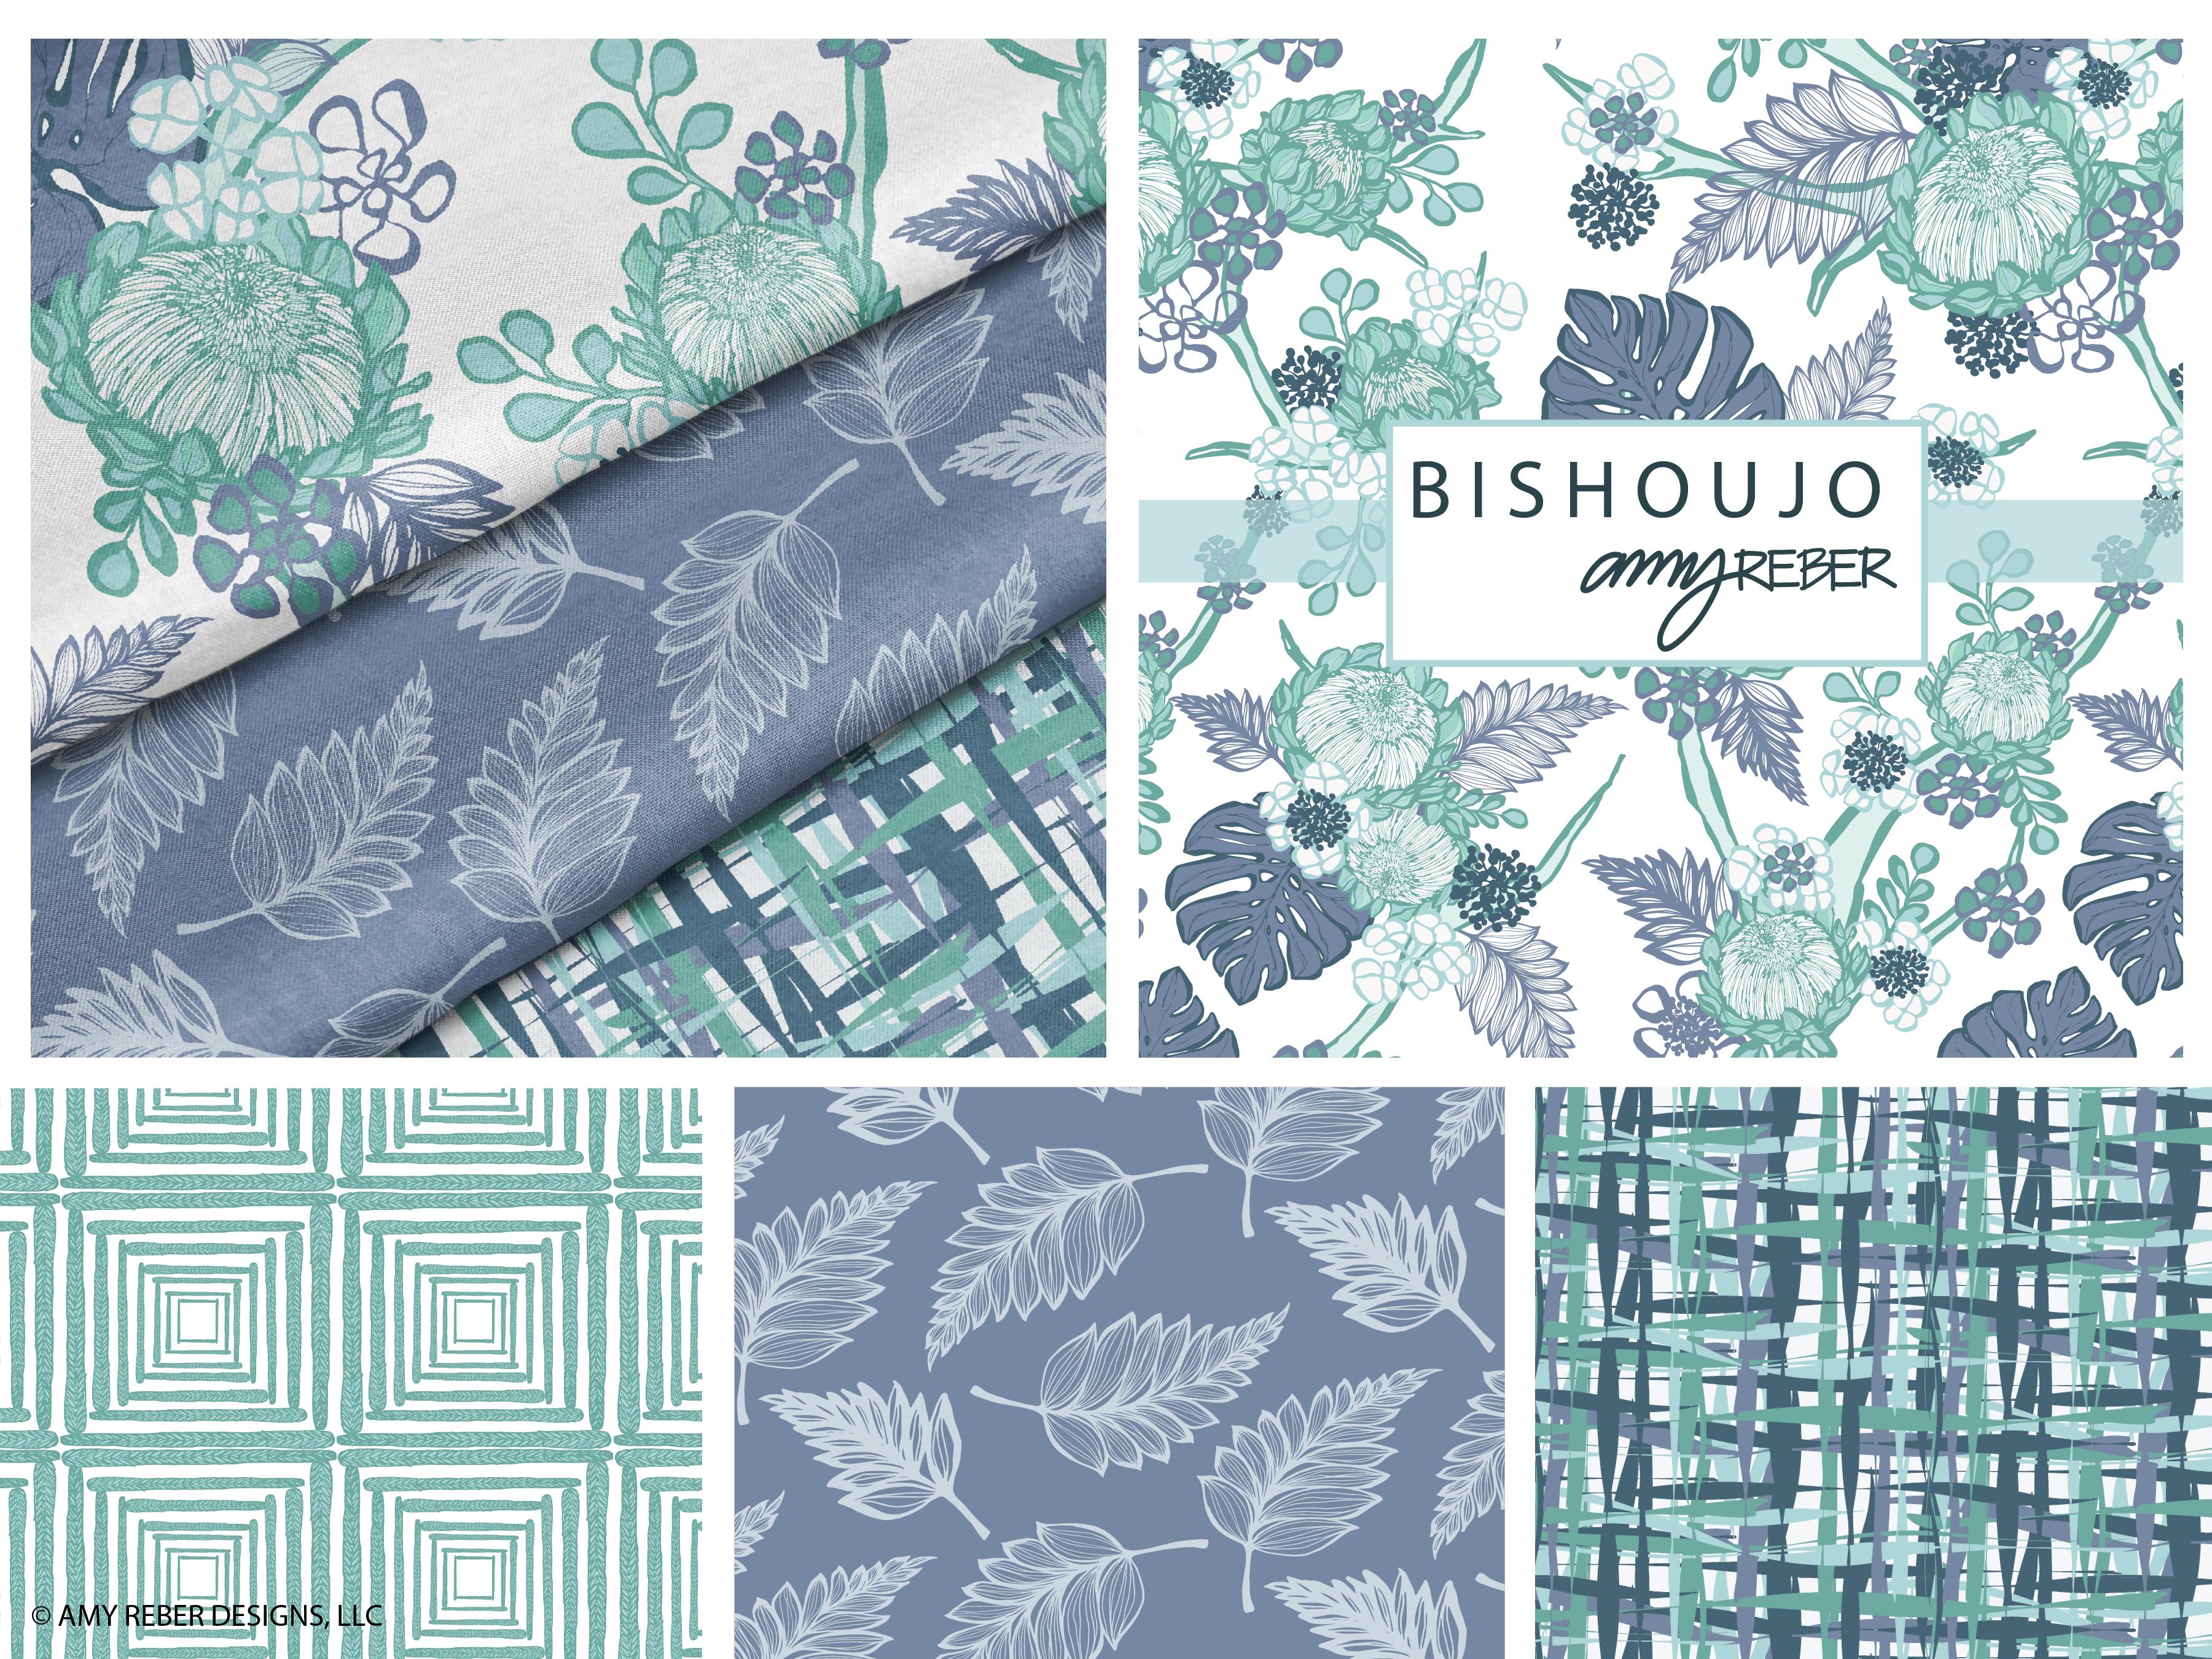 BISHOUJO BLUE-AMYREBER-01